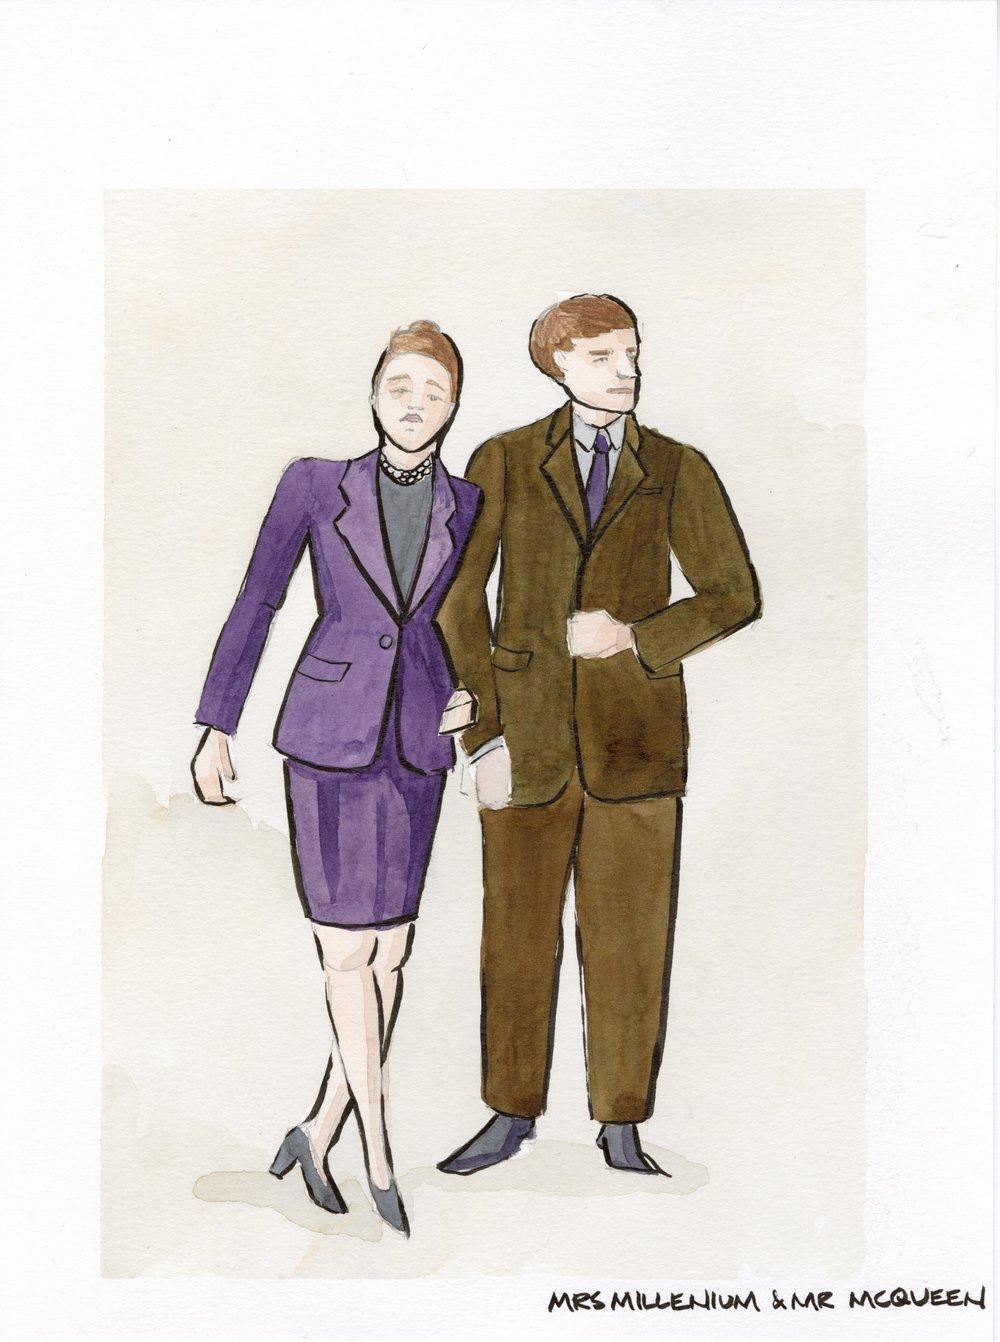 Mrs Millenium & Mr McQueen.jpg